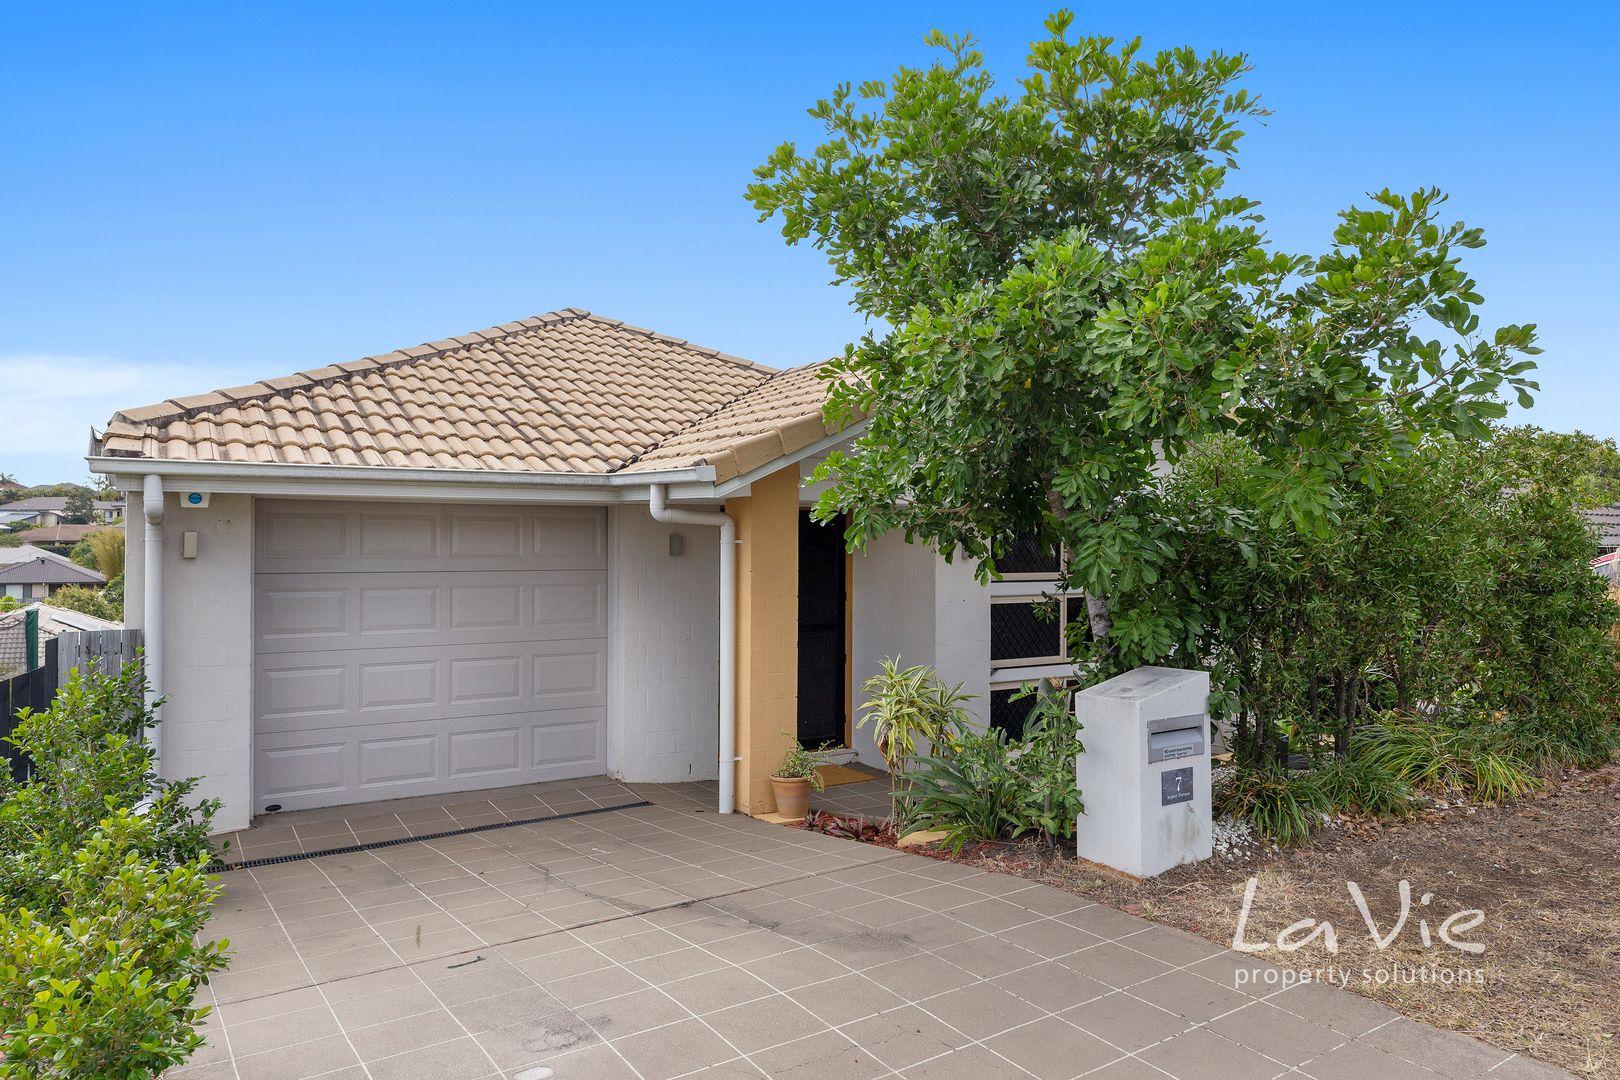 7 Aspect Terrace, Springfield Lakes QLD 4300, Image 0